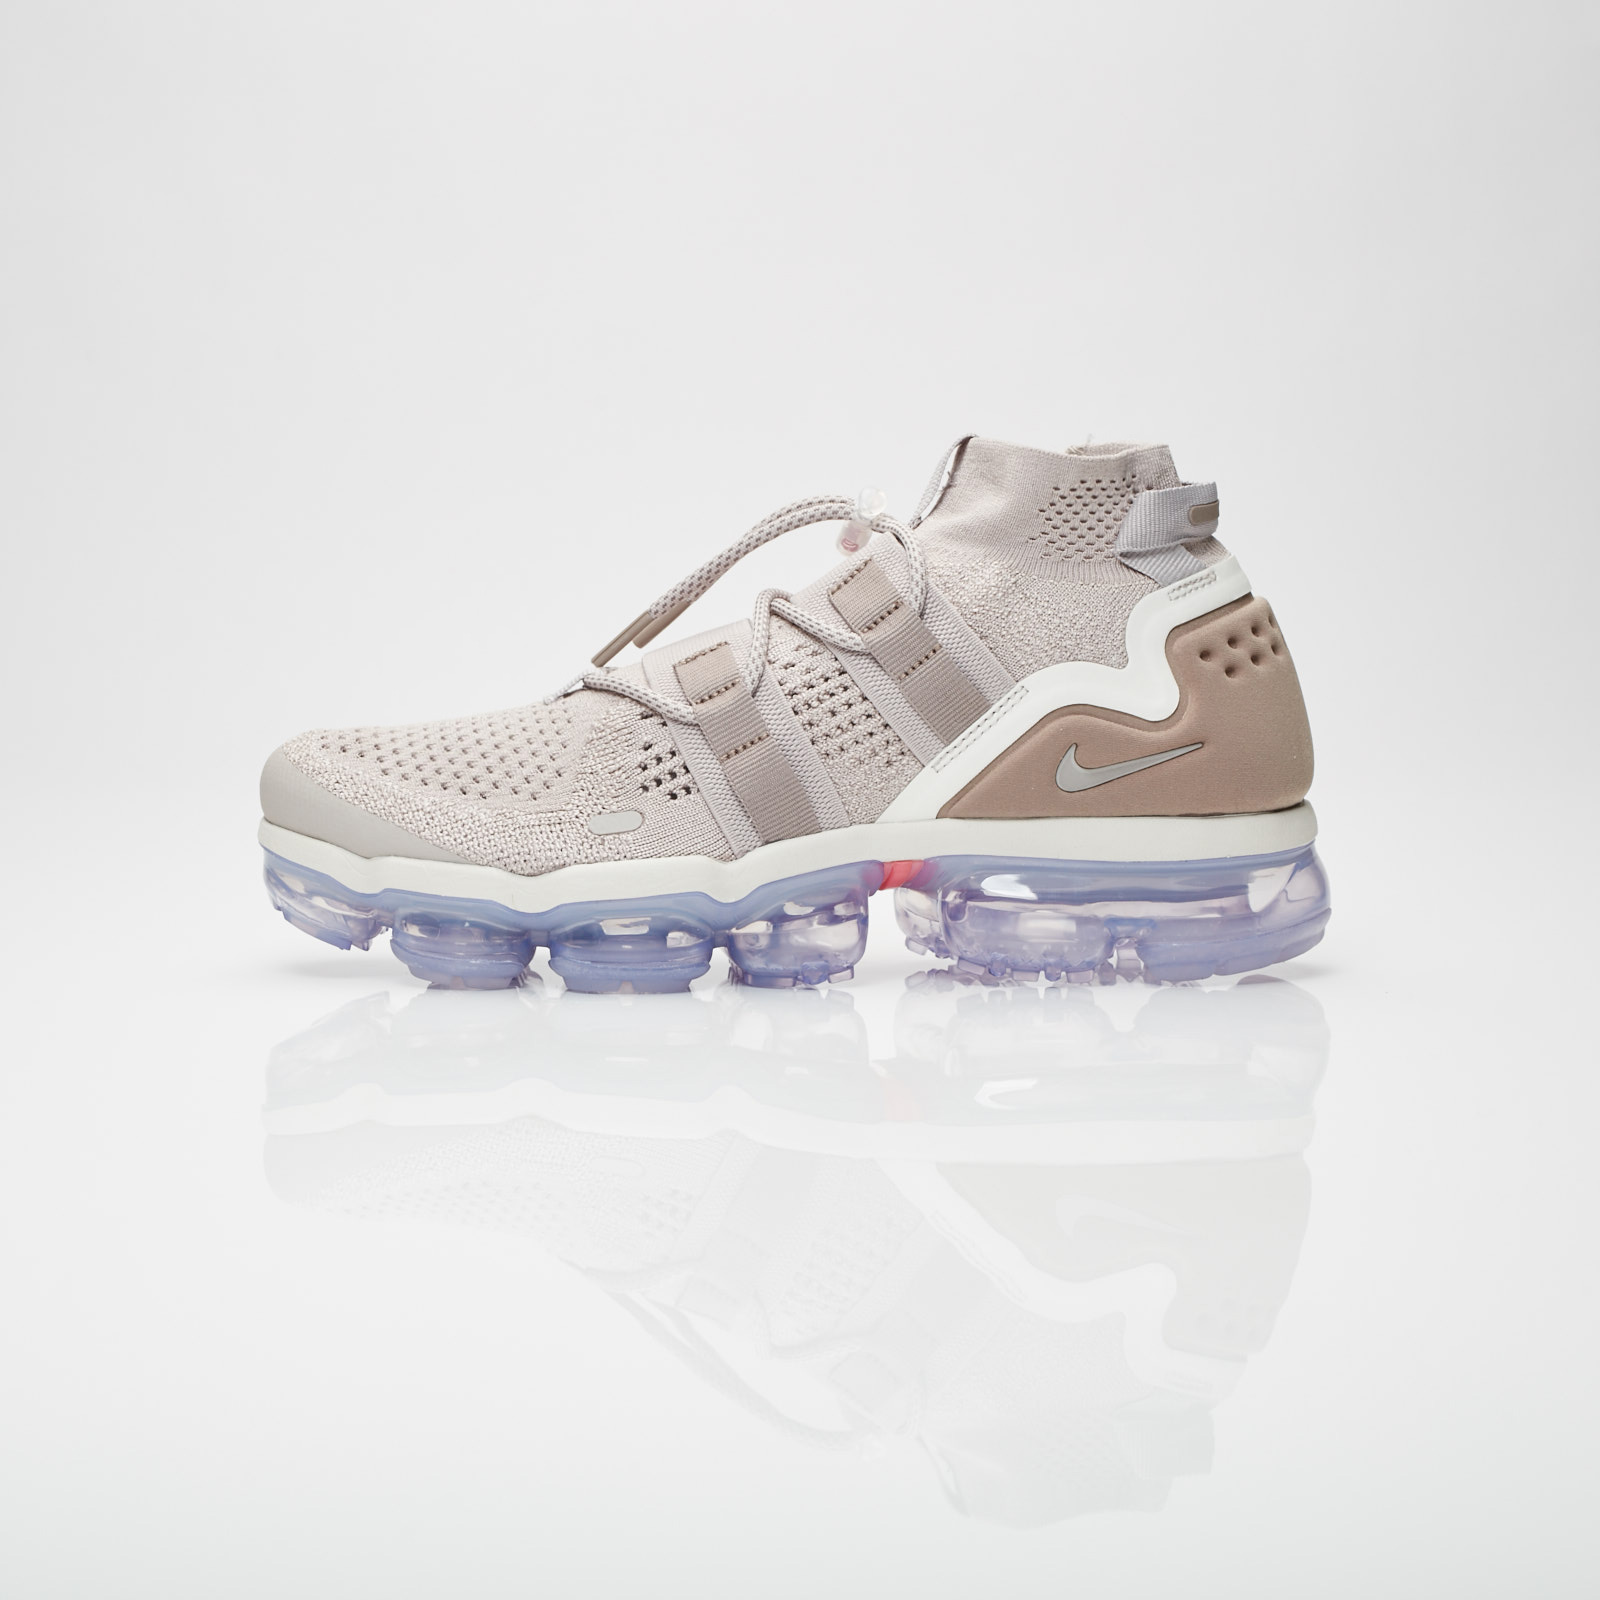 77e6f331949a Nike Air Vapormax FK Utility - Ah6834-205 - Sneakersnstuff ...